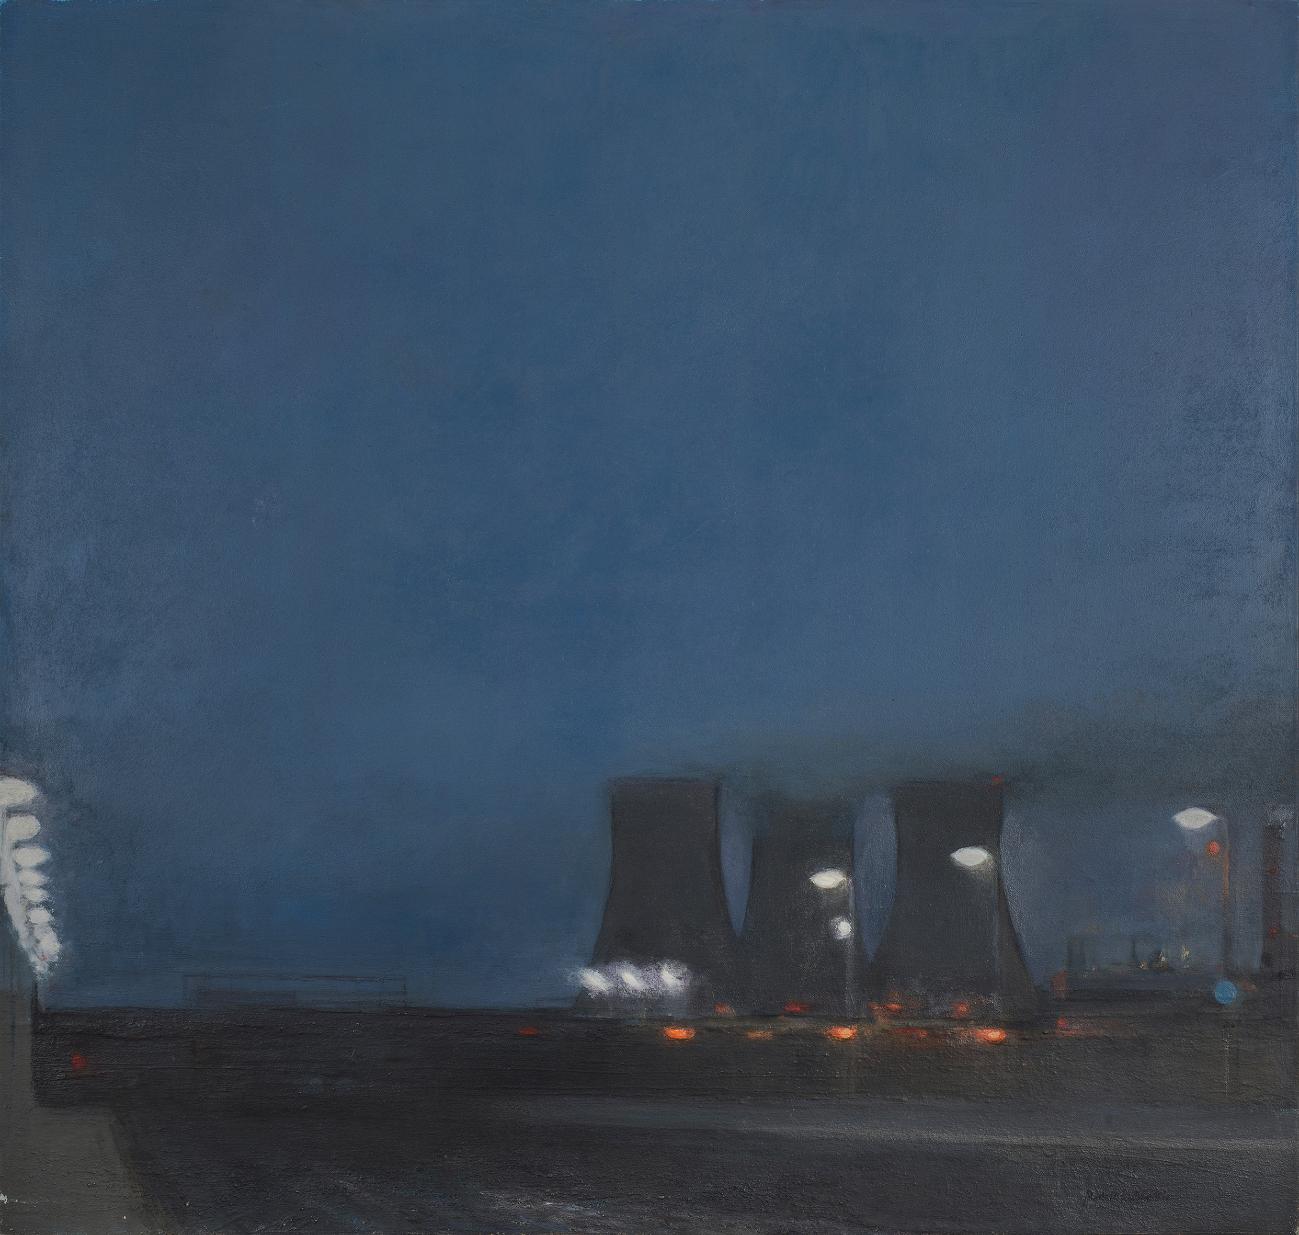 44 Electric Dusk, Twilight of an Era, 92x98cm, oil on linen